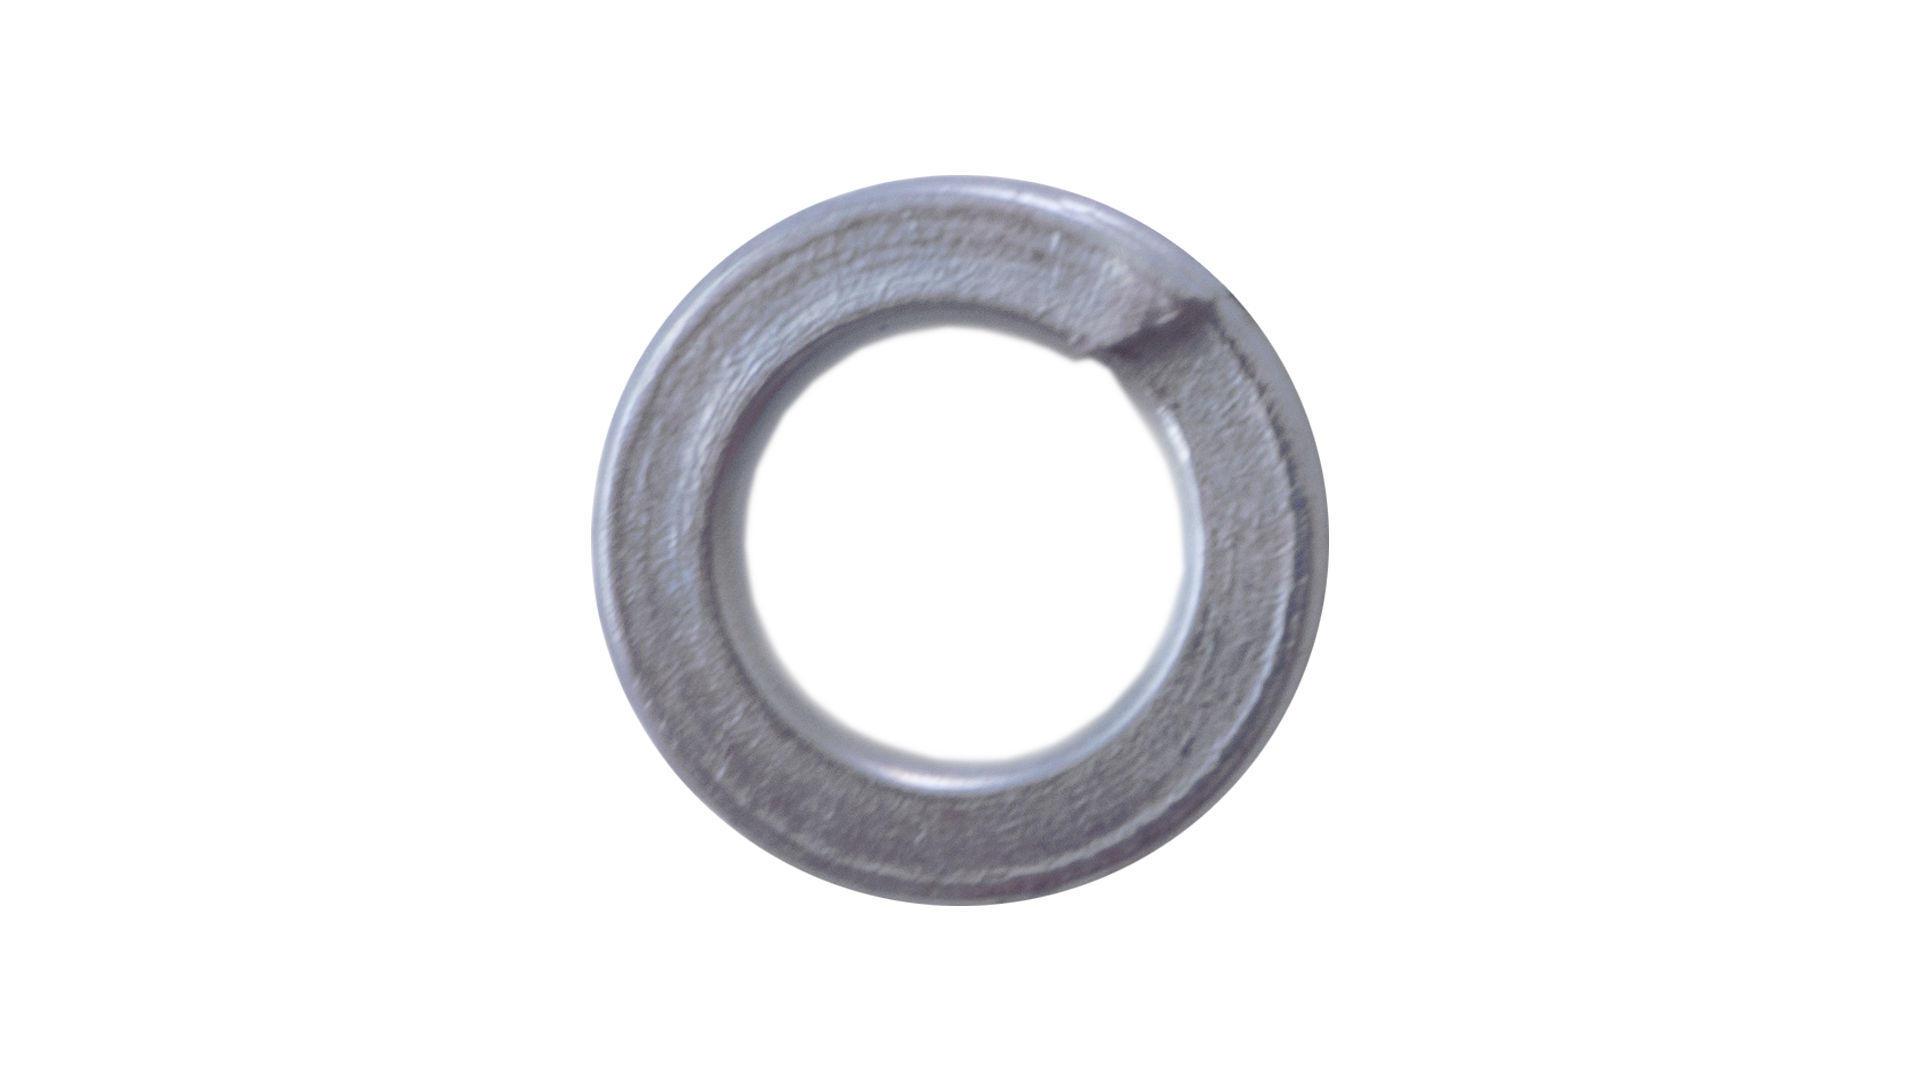 Шайба пружинная Apro - М8 DIN 127 (200 шт.) 4